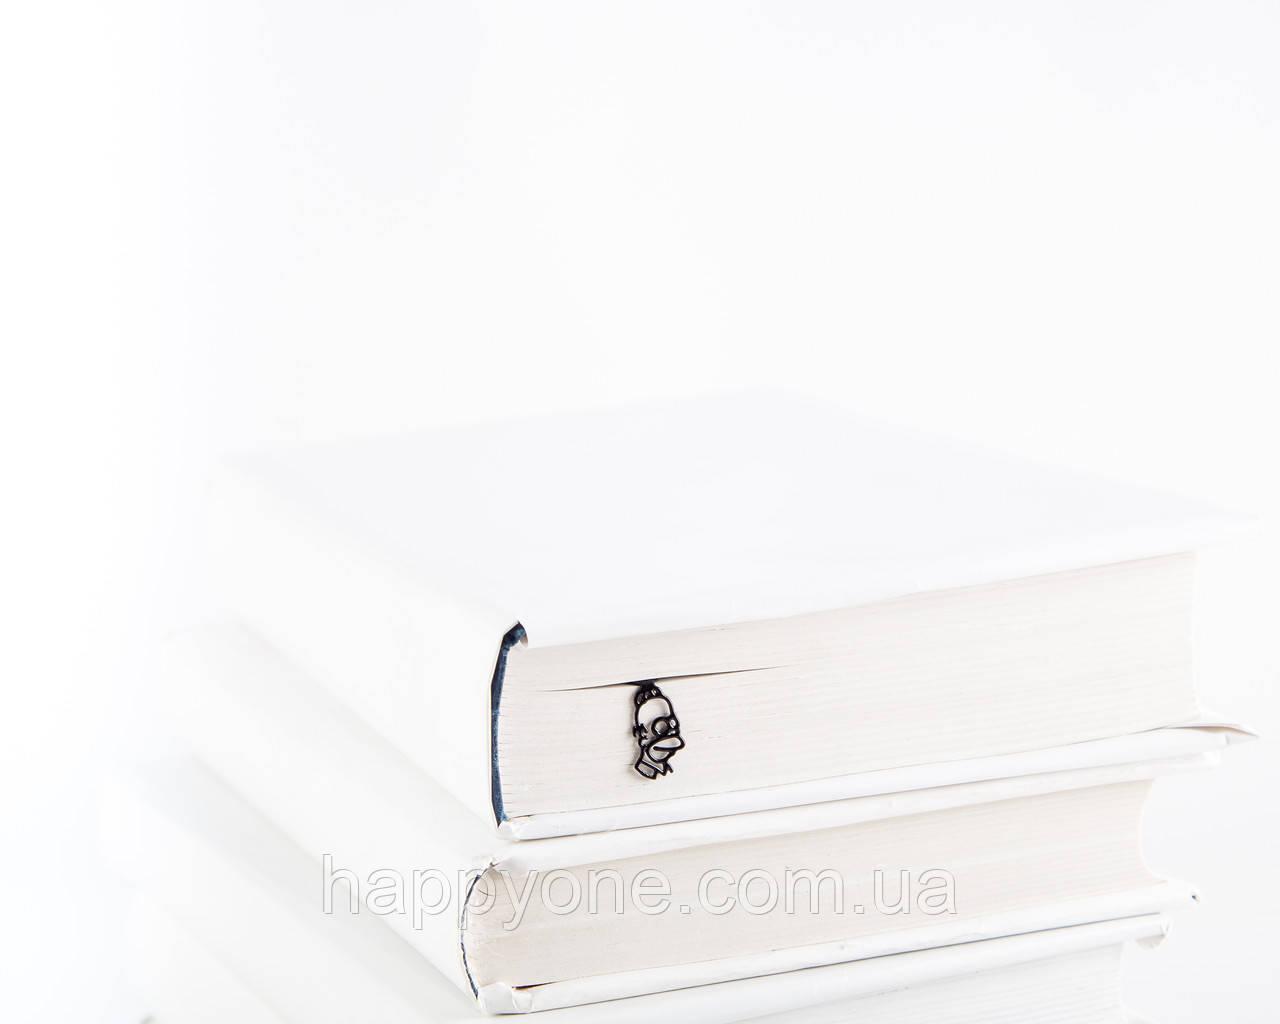 Закладка для книг Гомер Симпсон